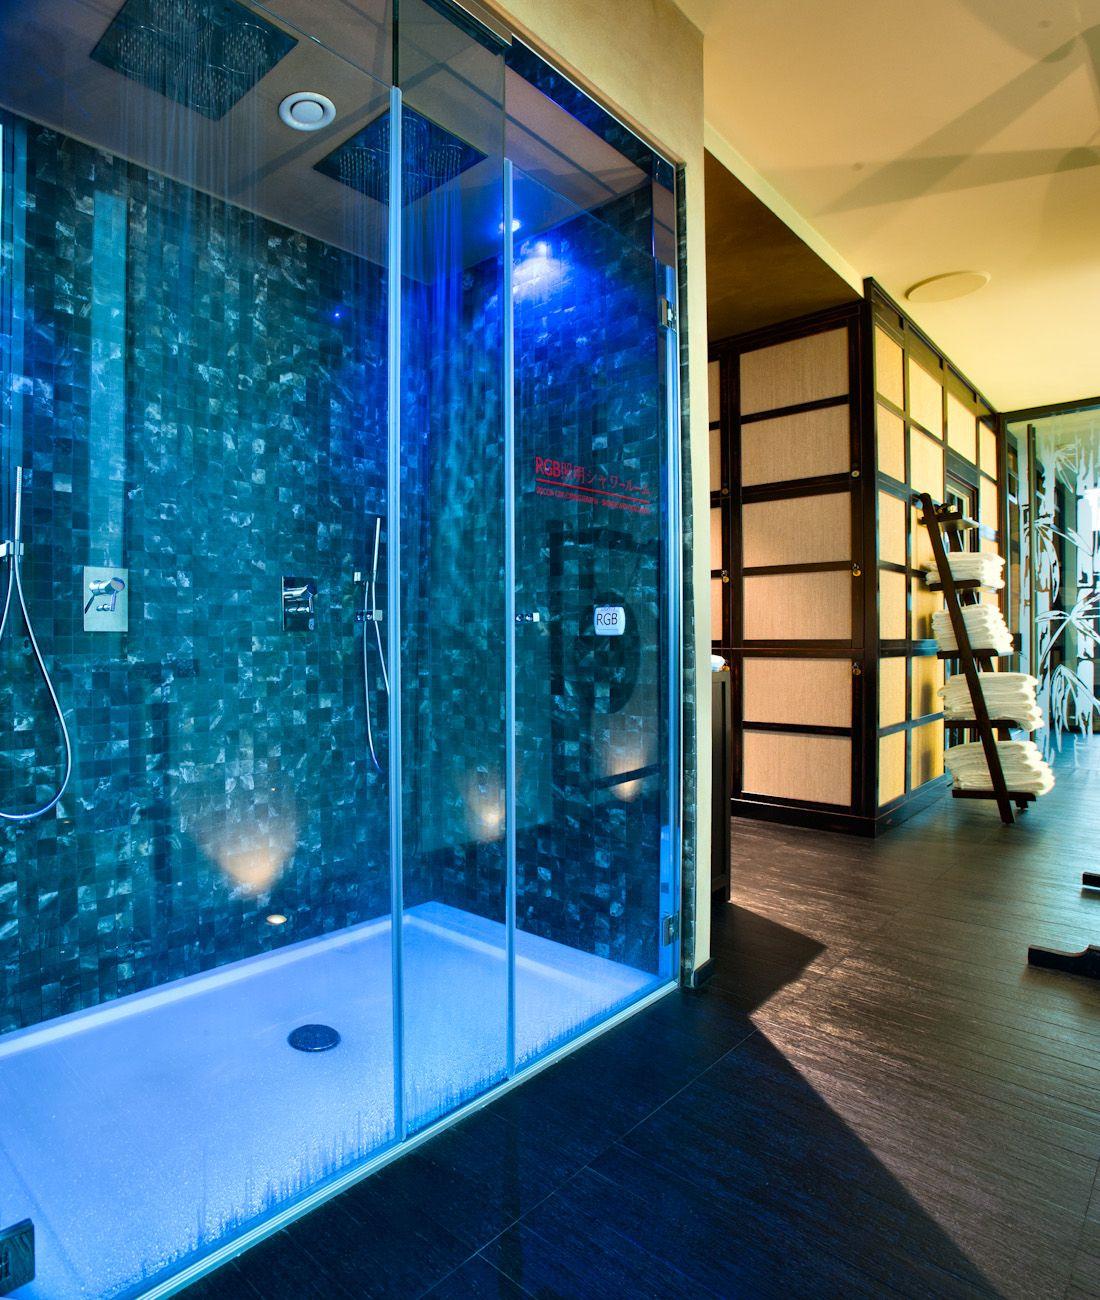 fzi-interiors.com   SPA & SAUNA PLACES & IDEAS   Pinterest   Spa ...